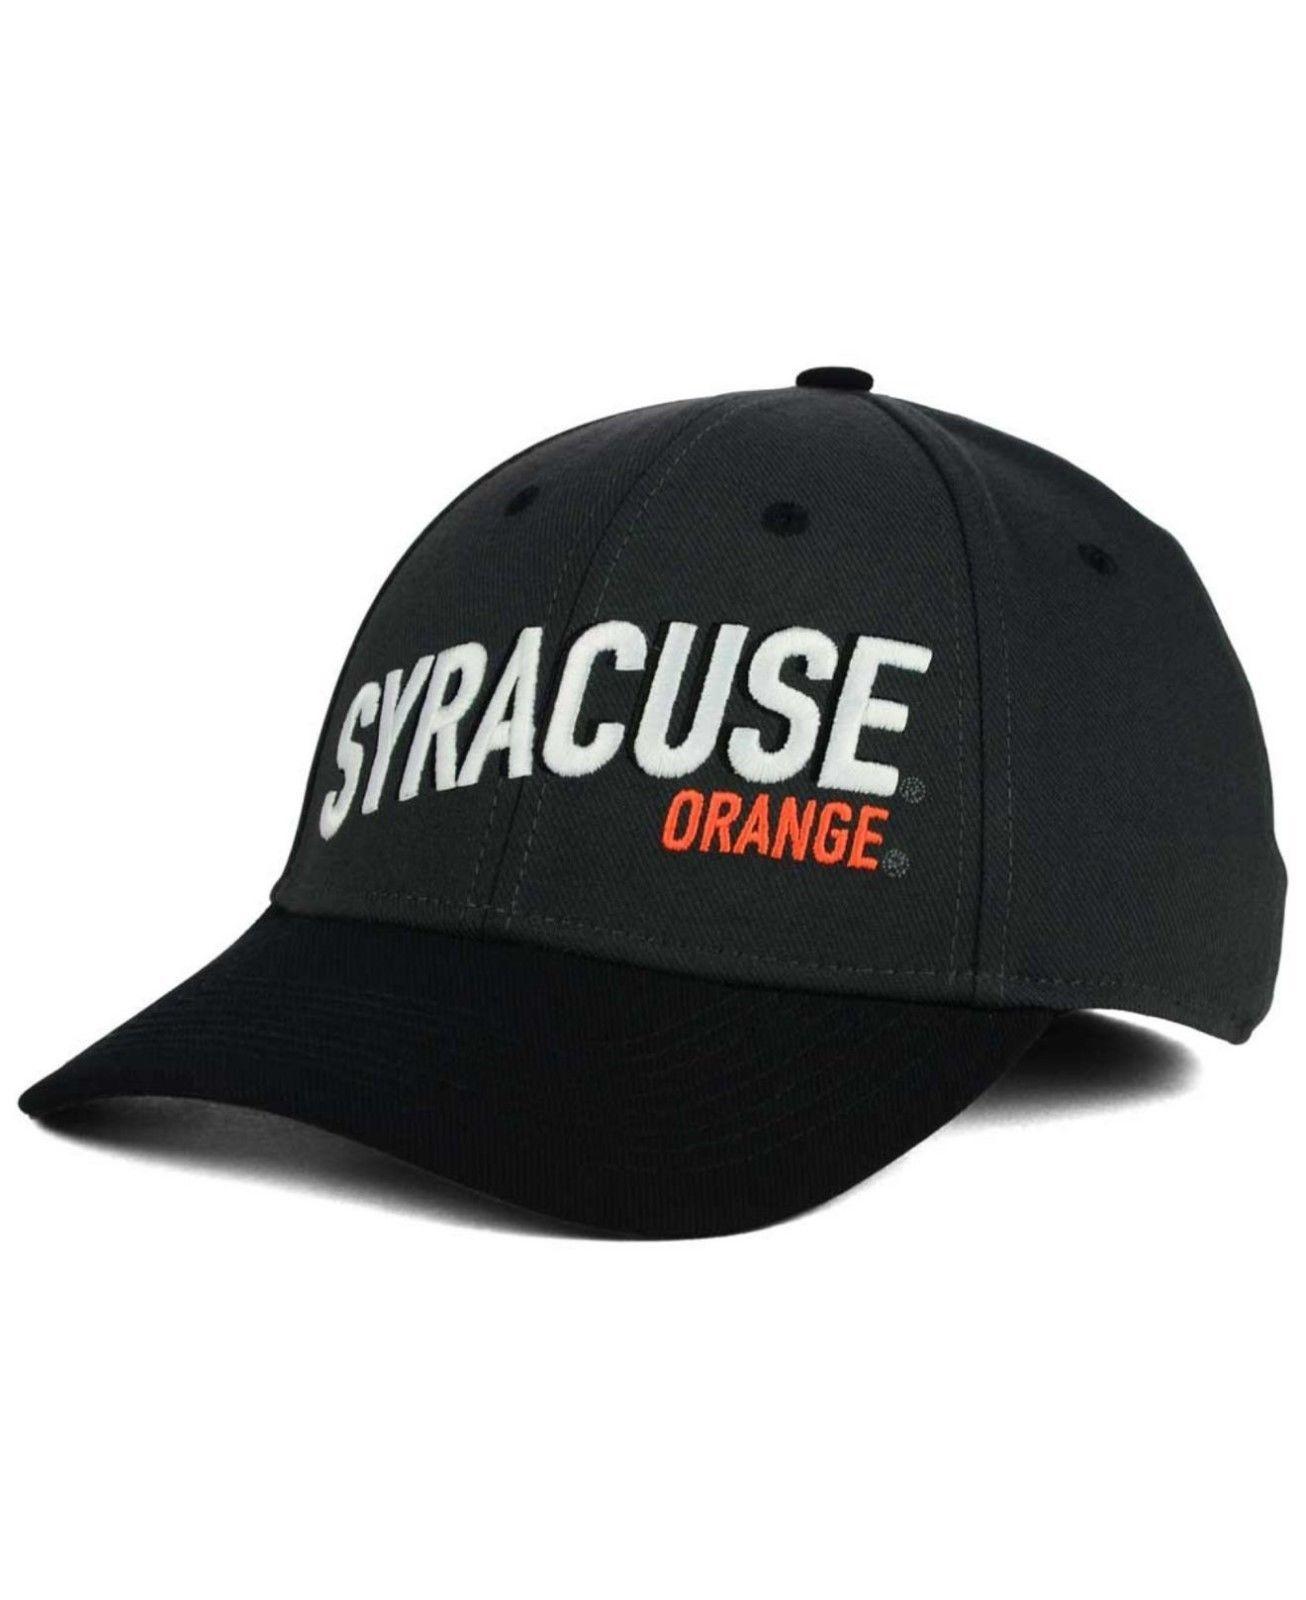 82fda18cdceaa NWT New Syracuse Orange Nike Dri-Fit NCAA and 50 similar items